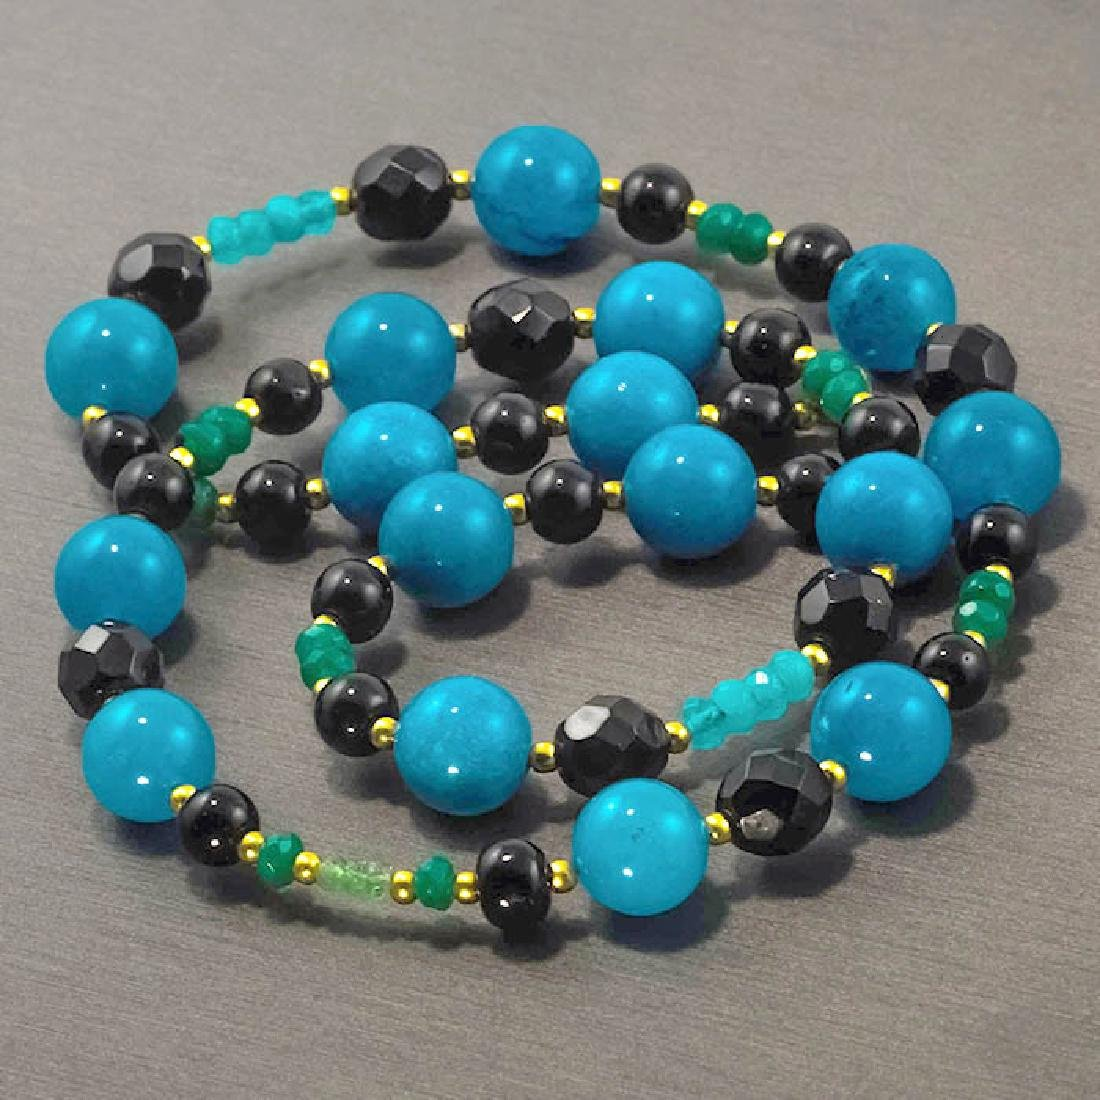 Jade Necklace with Emeralds, Aquamarine, Black and - 3